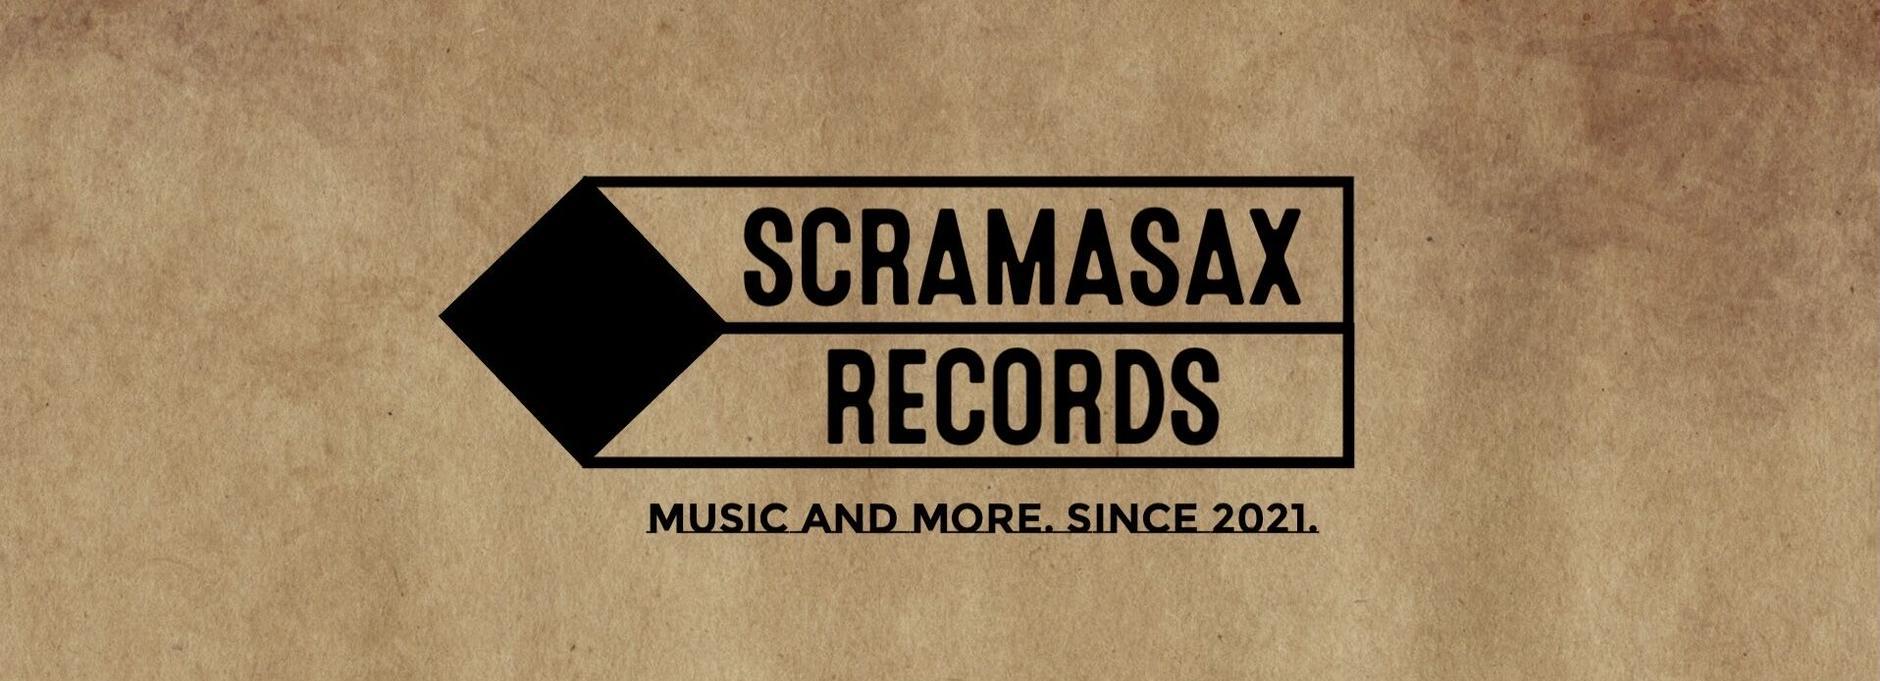 SCRAMASAX RECORDS STORE